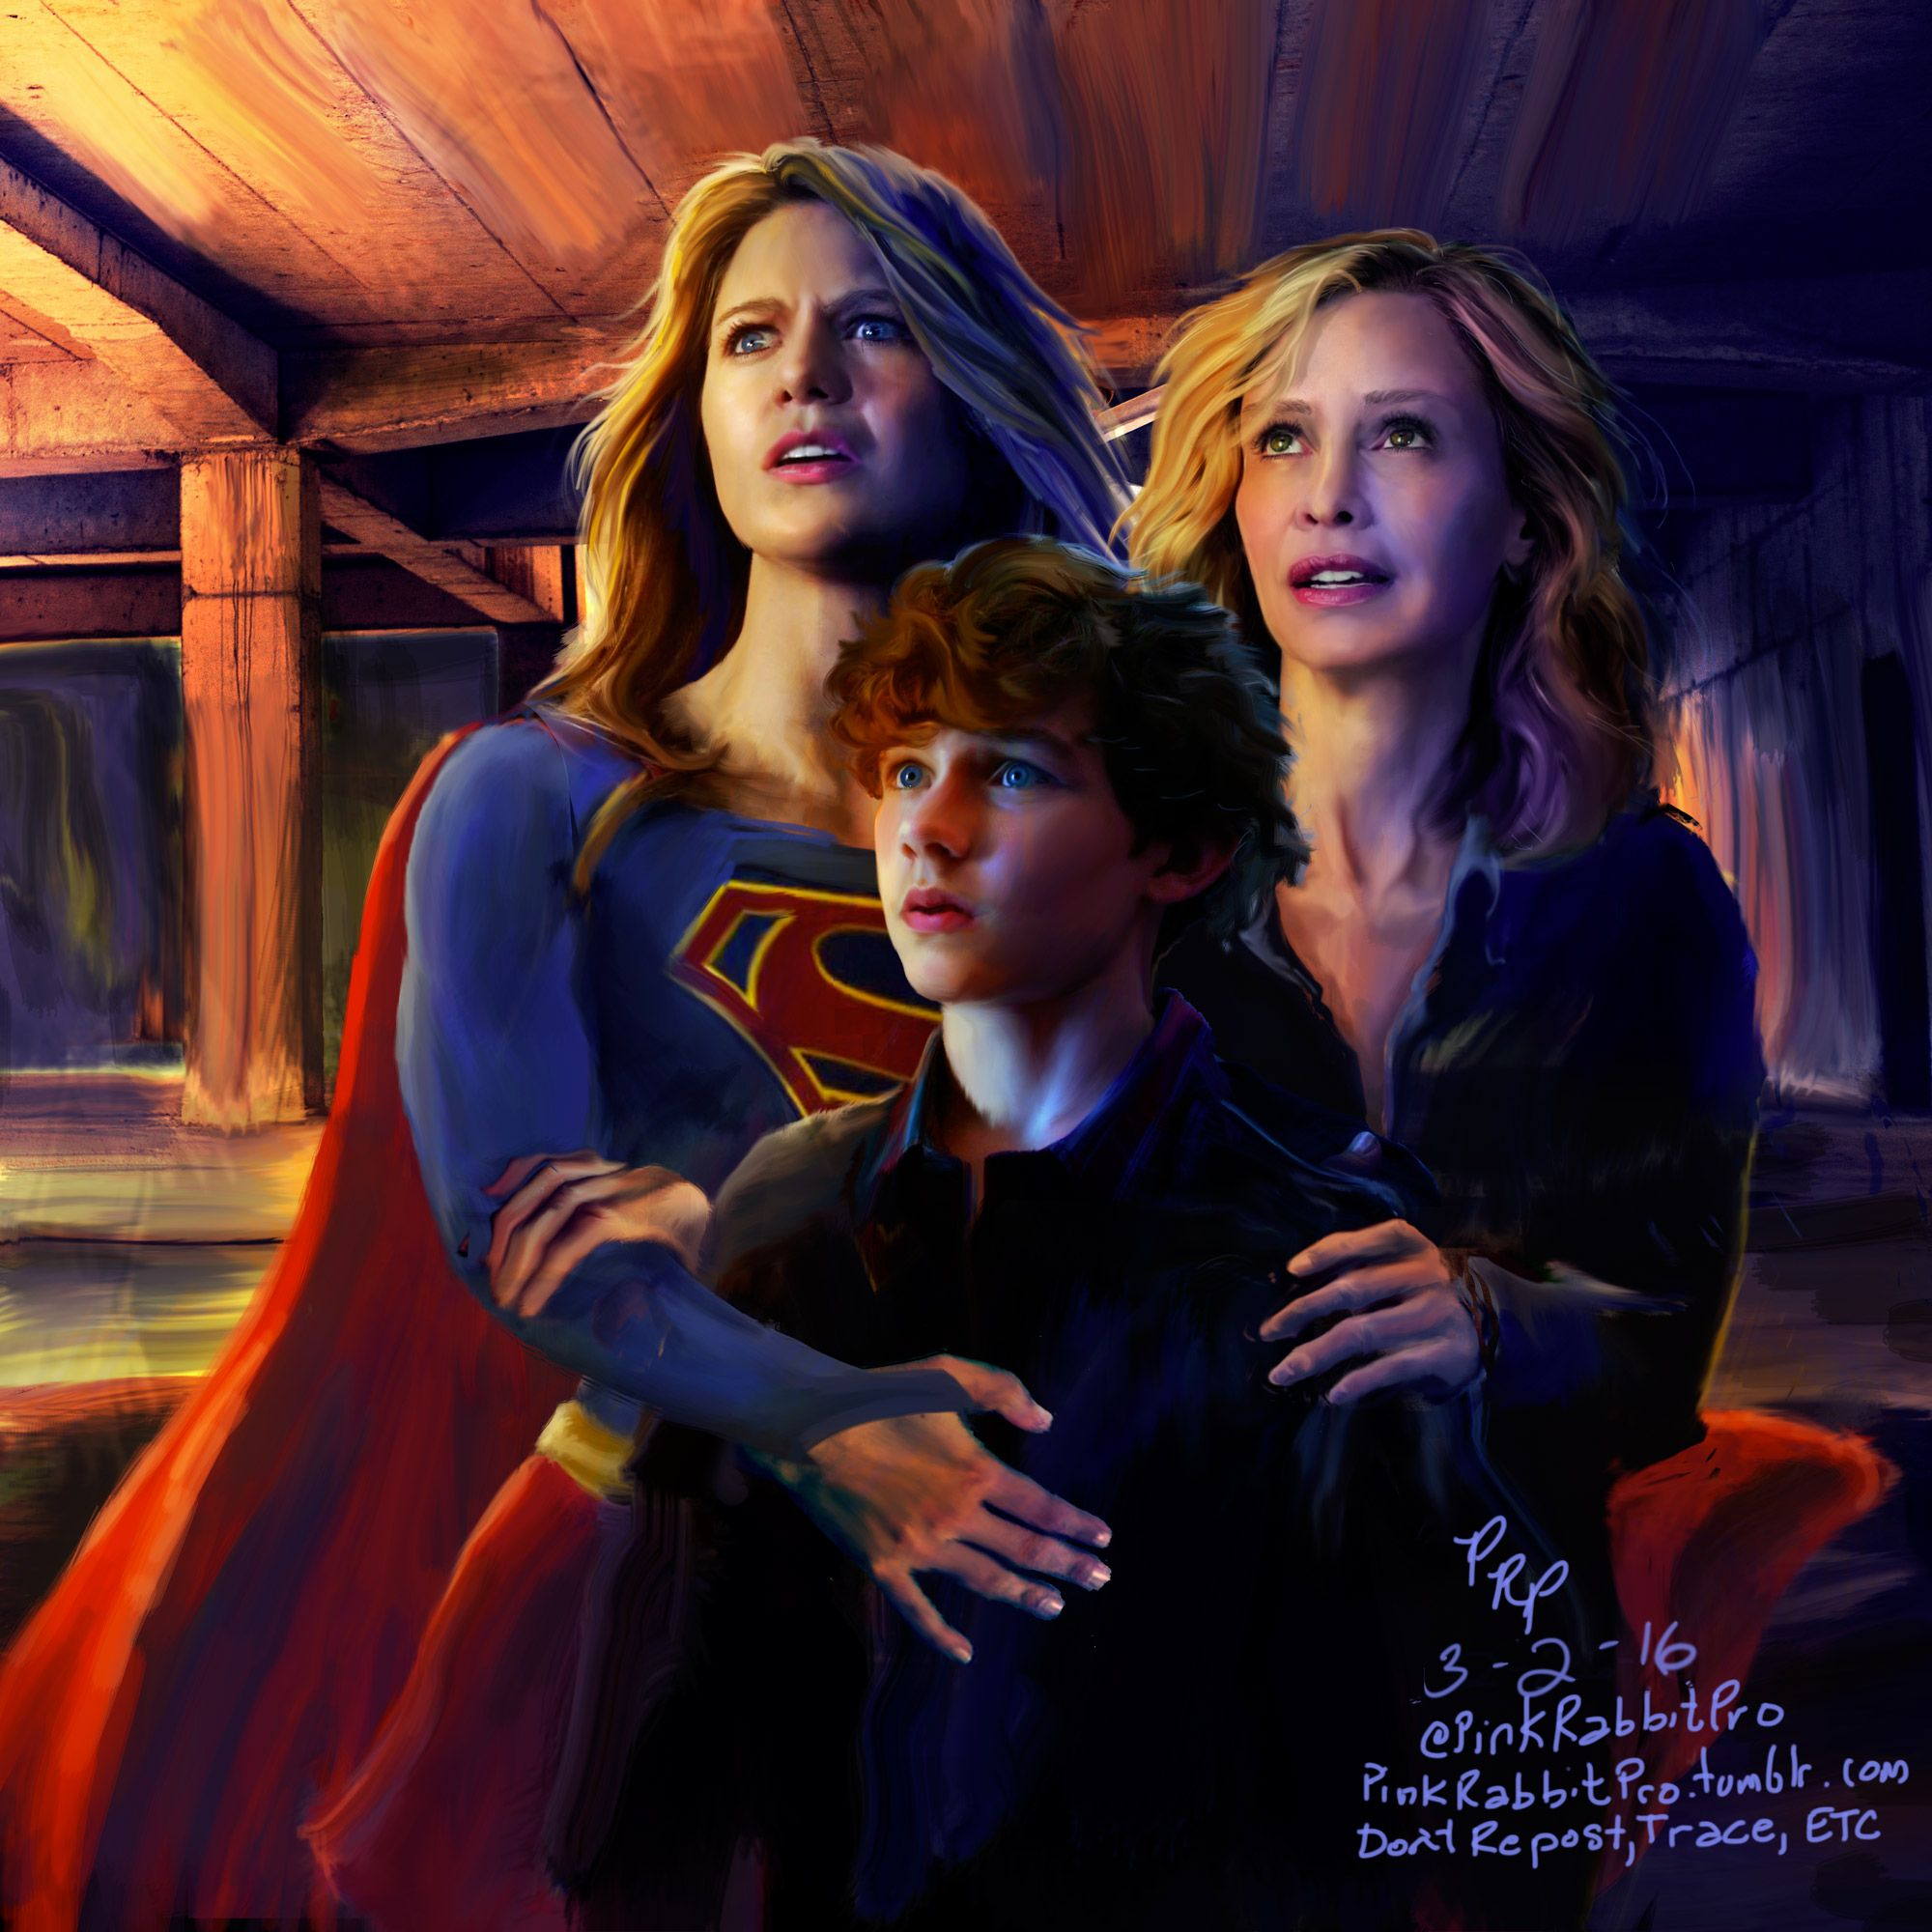 Supergirl erotic fan art